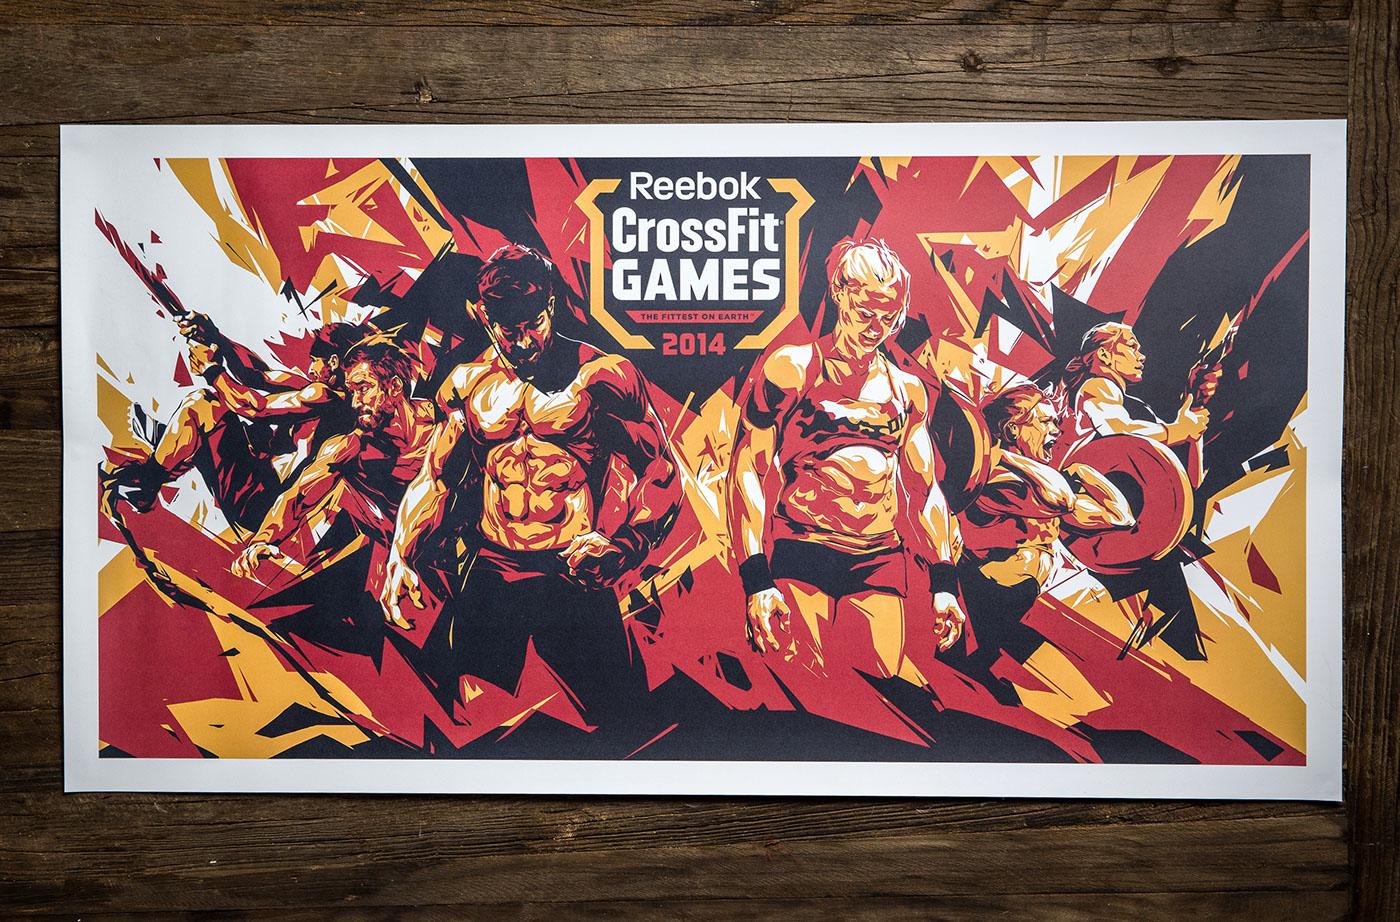 Reebok crossfit games 2014 wallpaper